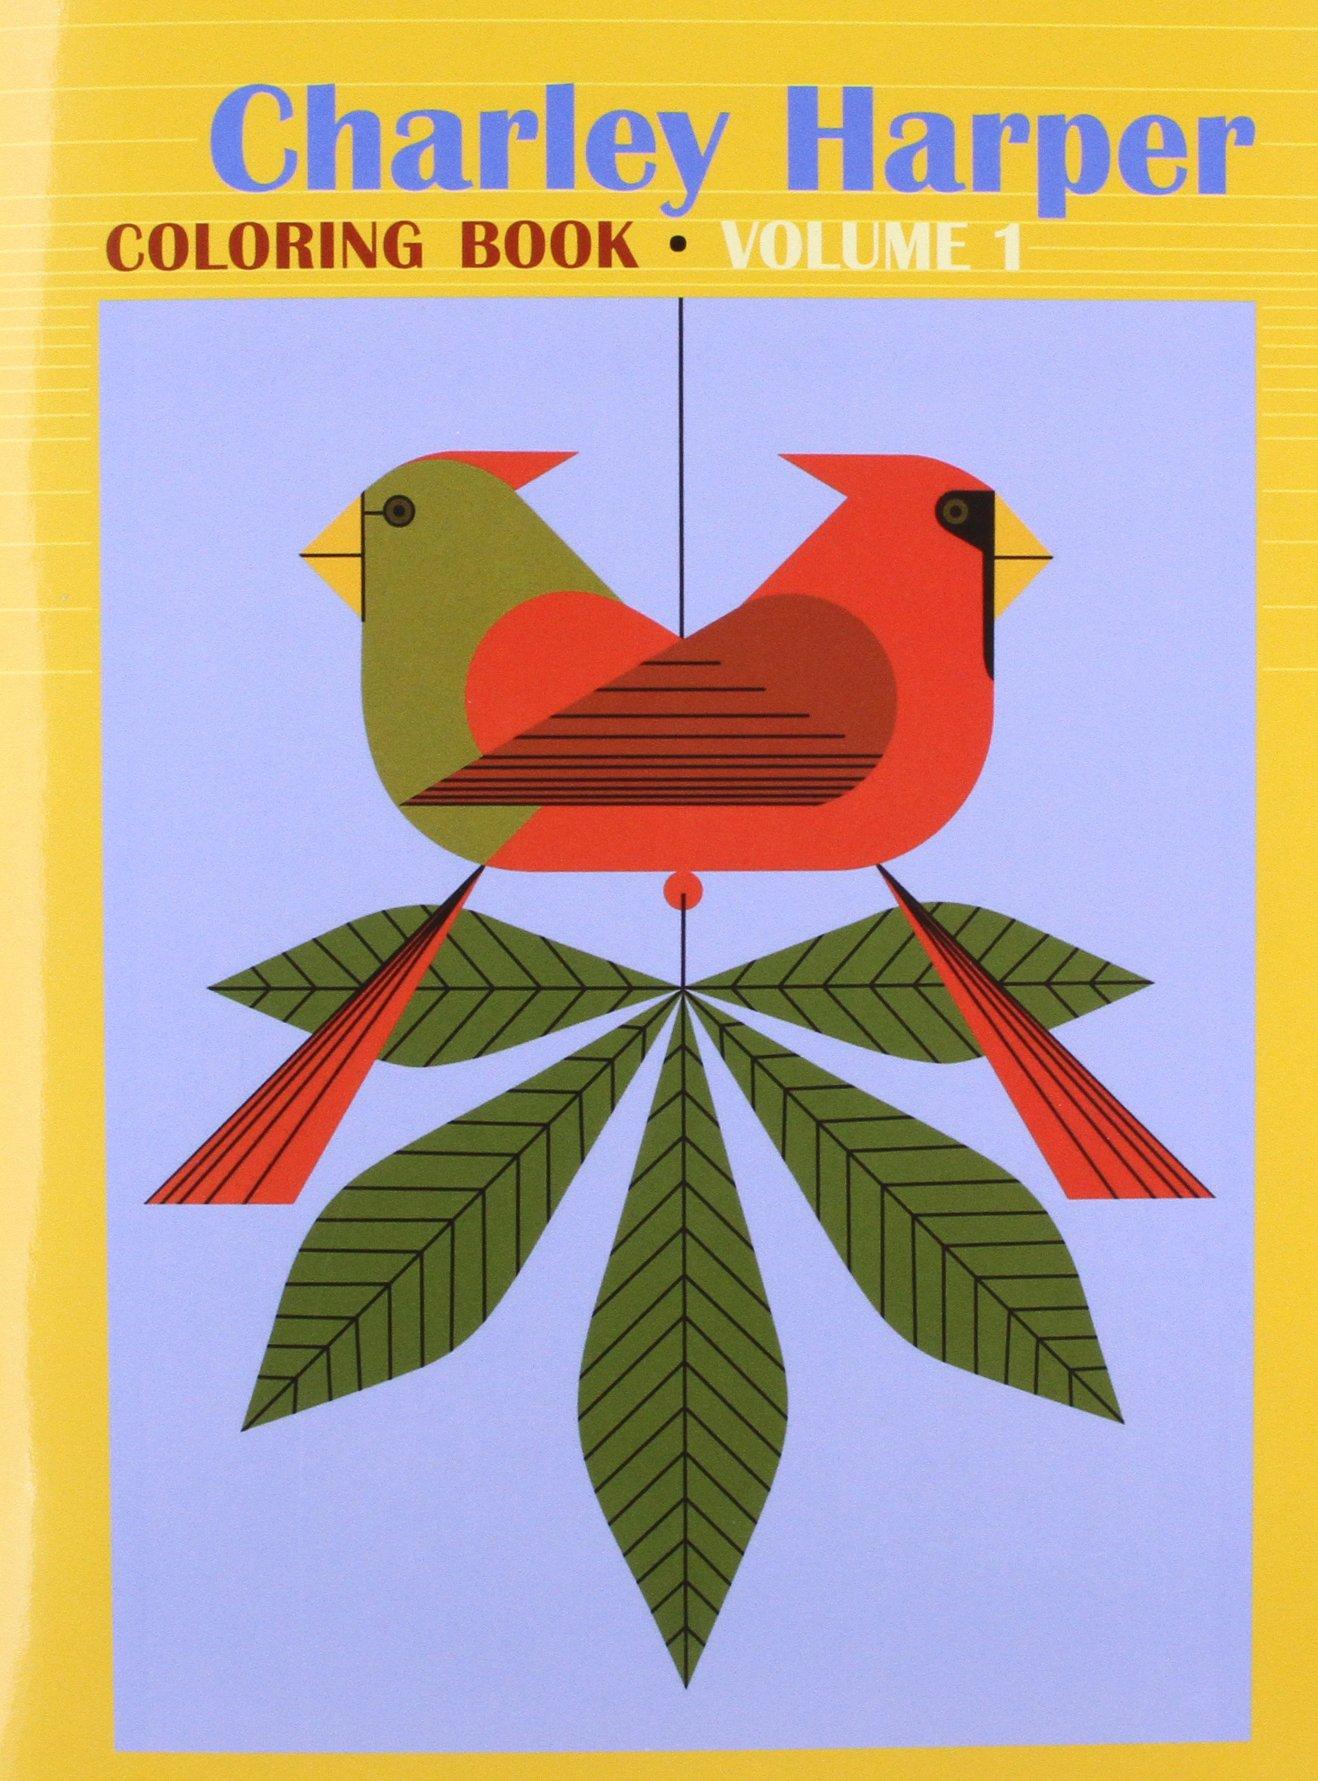 Charley Harper Coloring Book, Vol. 1: Charley Harper ...